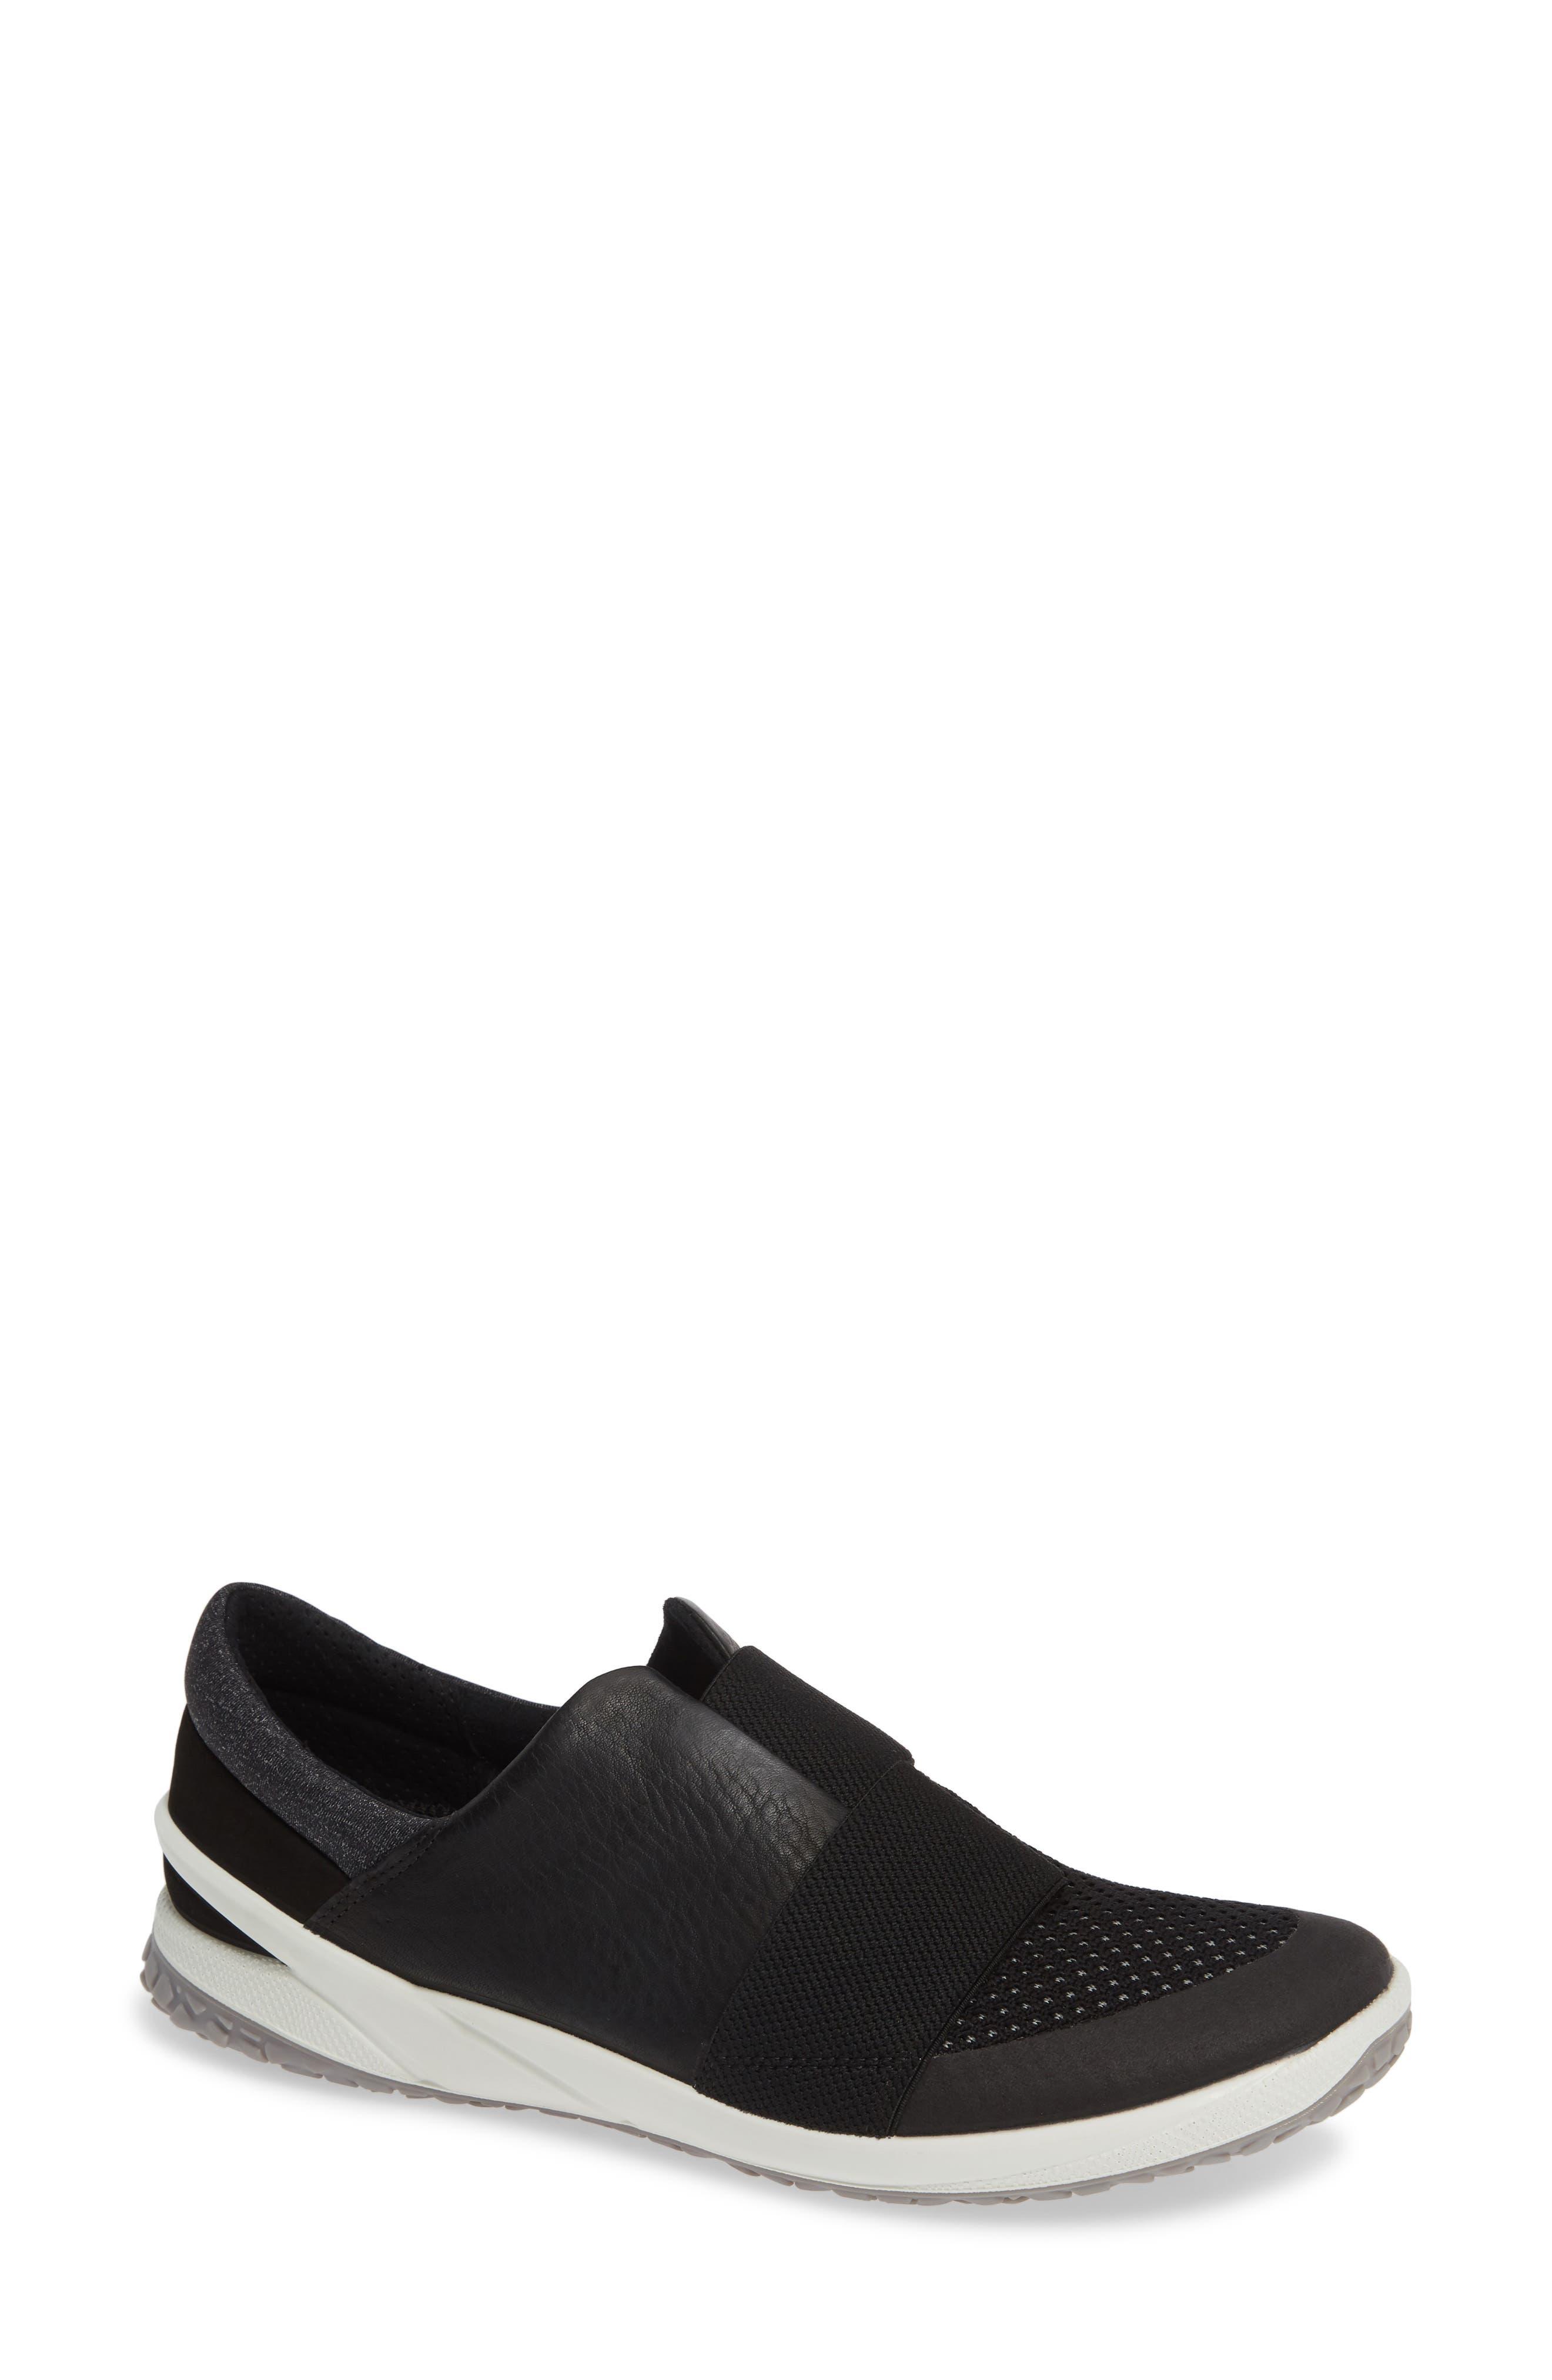 BIOM Slip-On Sneaker, Main, color, BLACK LEATHER